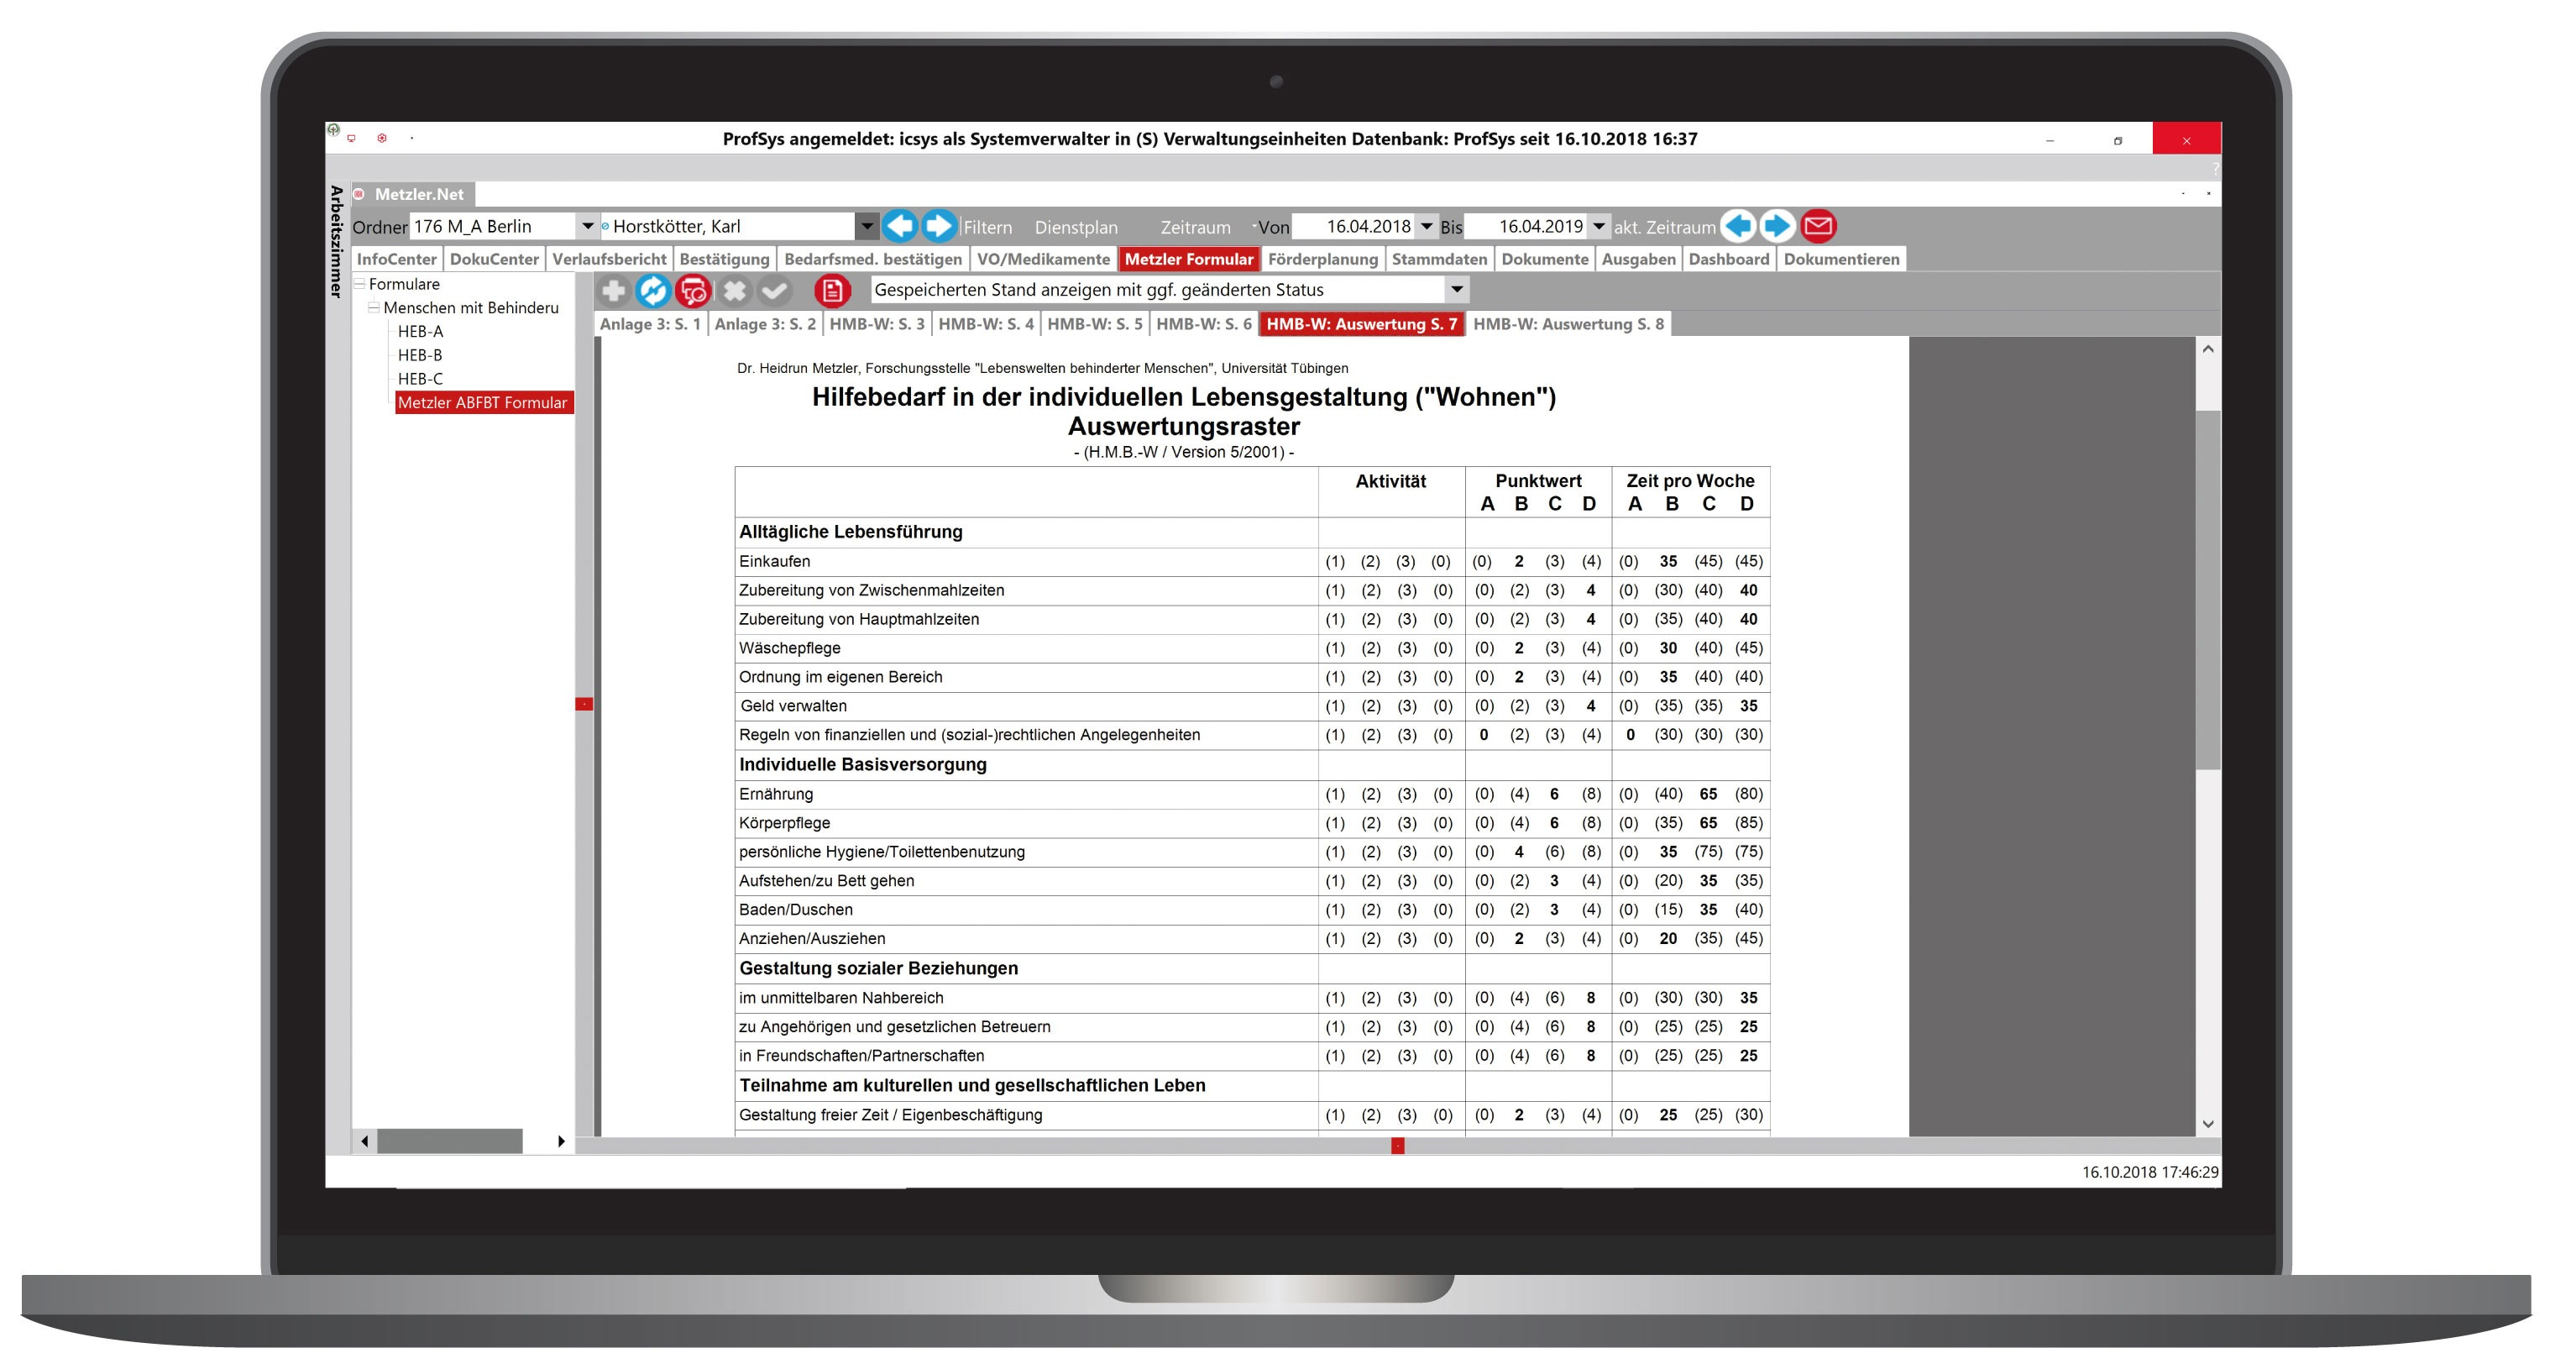 profsys_behindertenhilfe_stationaer_planung_und_dokumentation